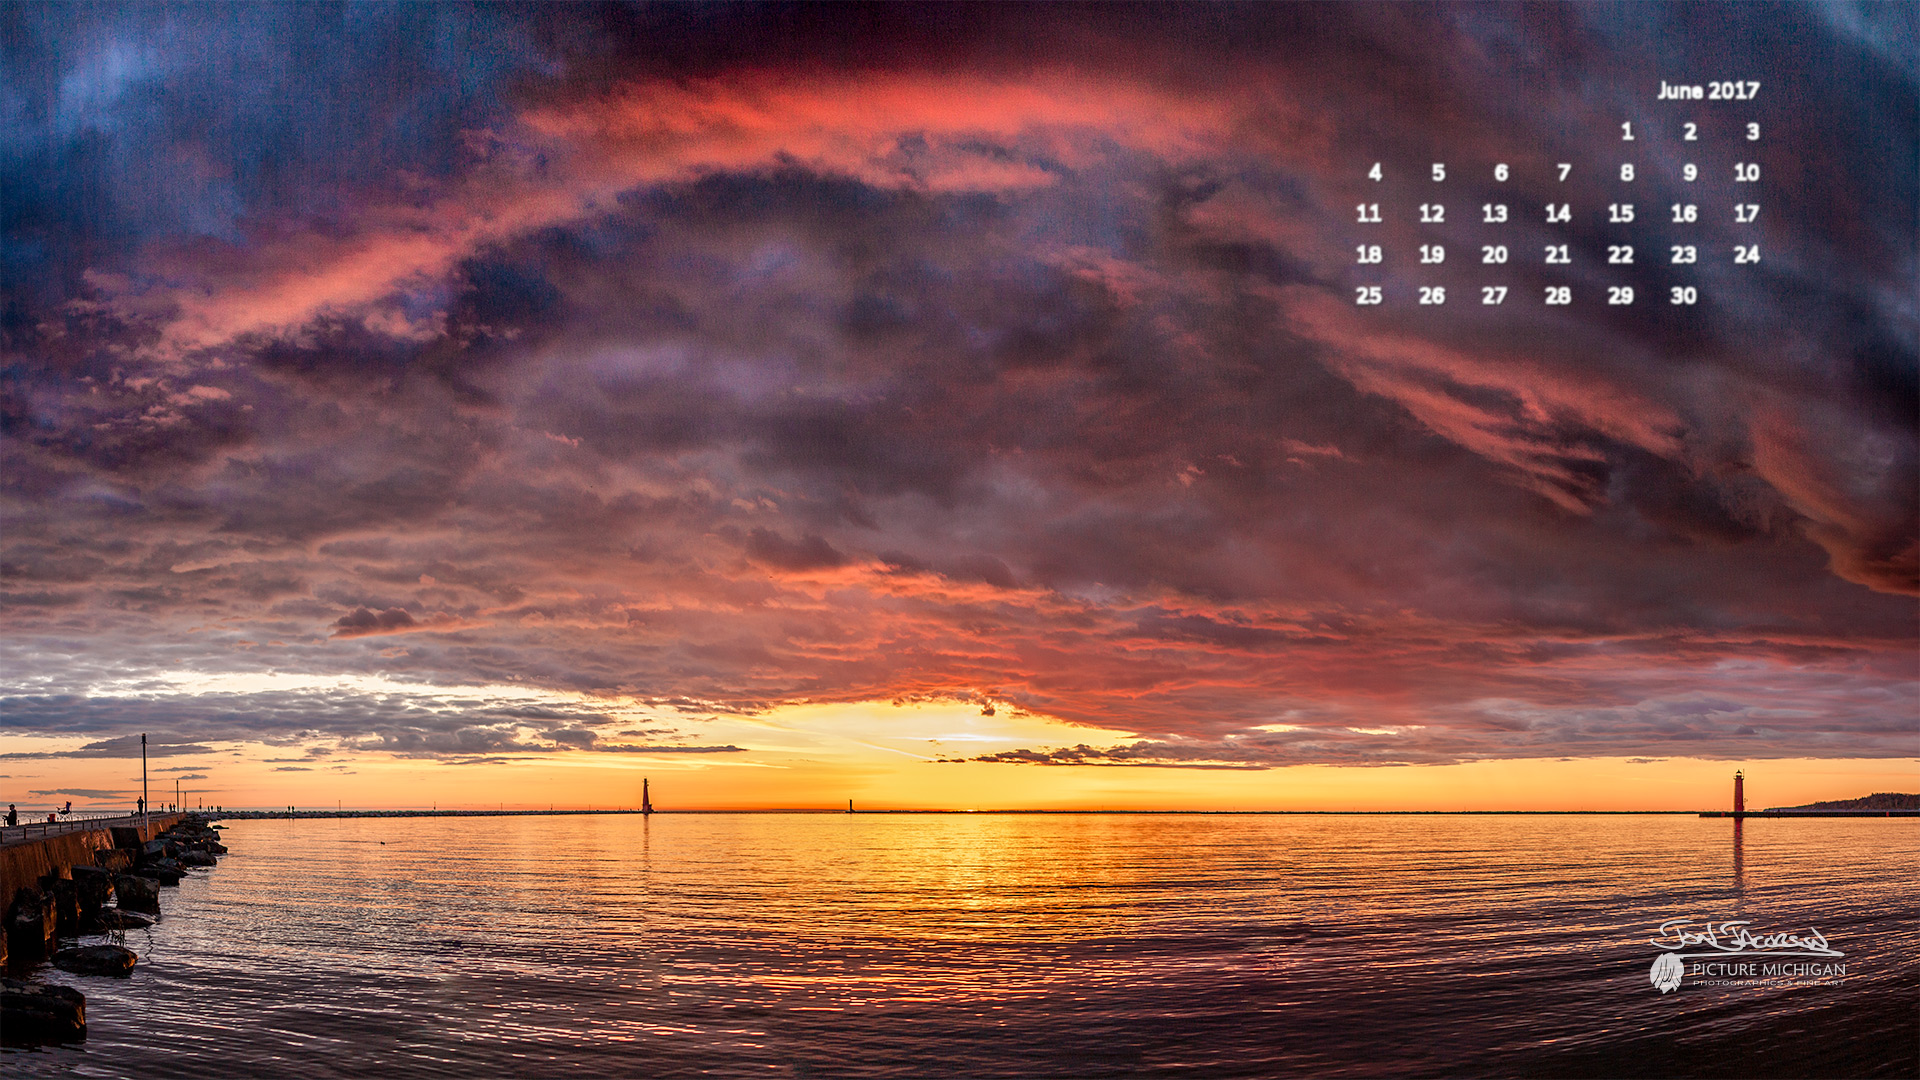 June 2017 Calendar Desktop Wallpaper Sunset over Lake Michigan 1920x1080